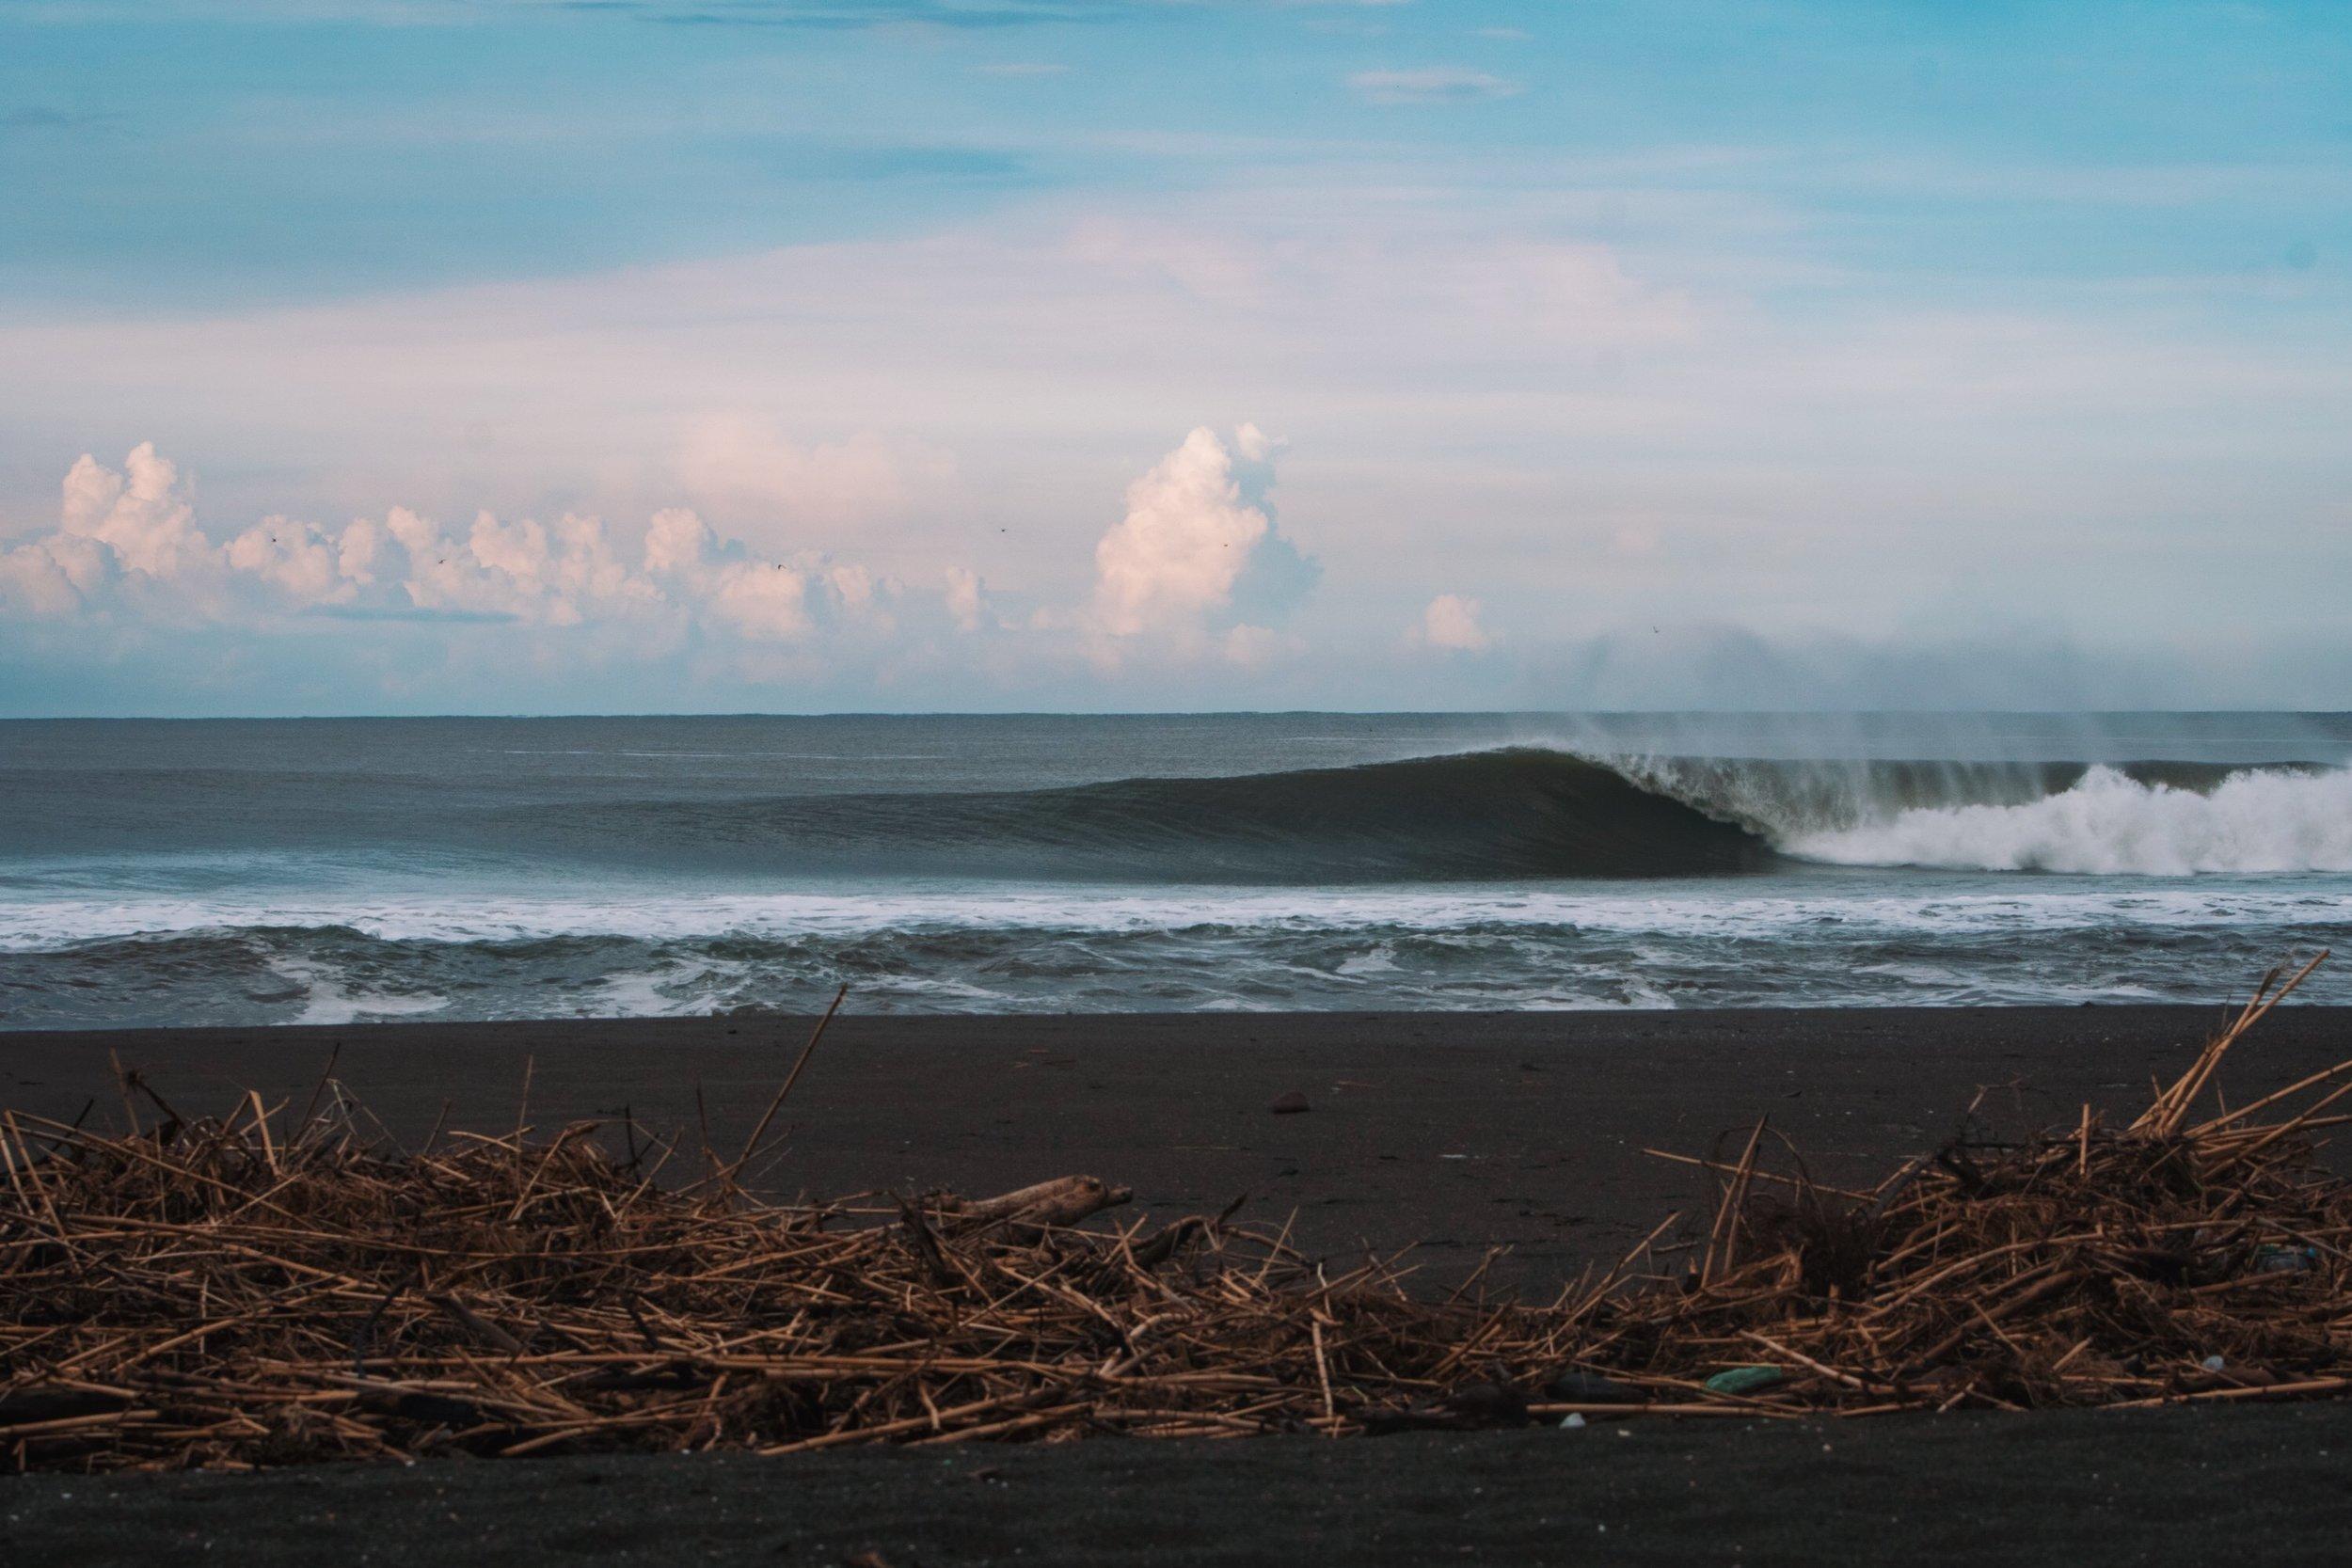 Tristan-Guibald-Surf-México-Sayulita-Pascuales-Zihuatanejo-Fotografía-Heiko-Bothe-3.JPG